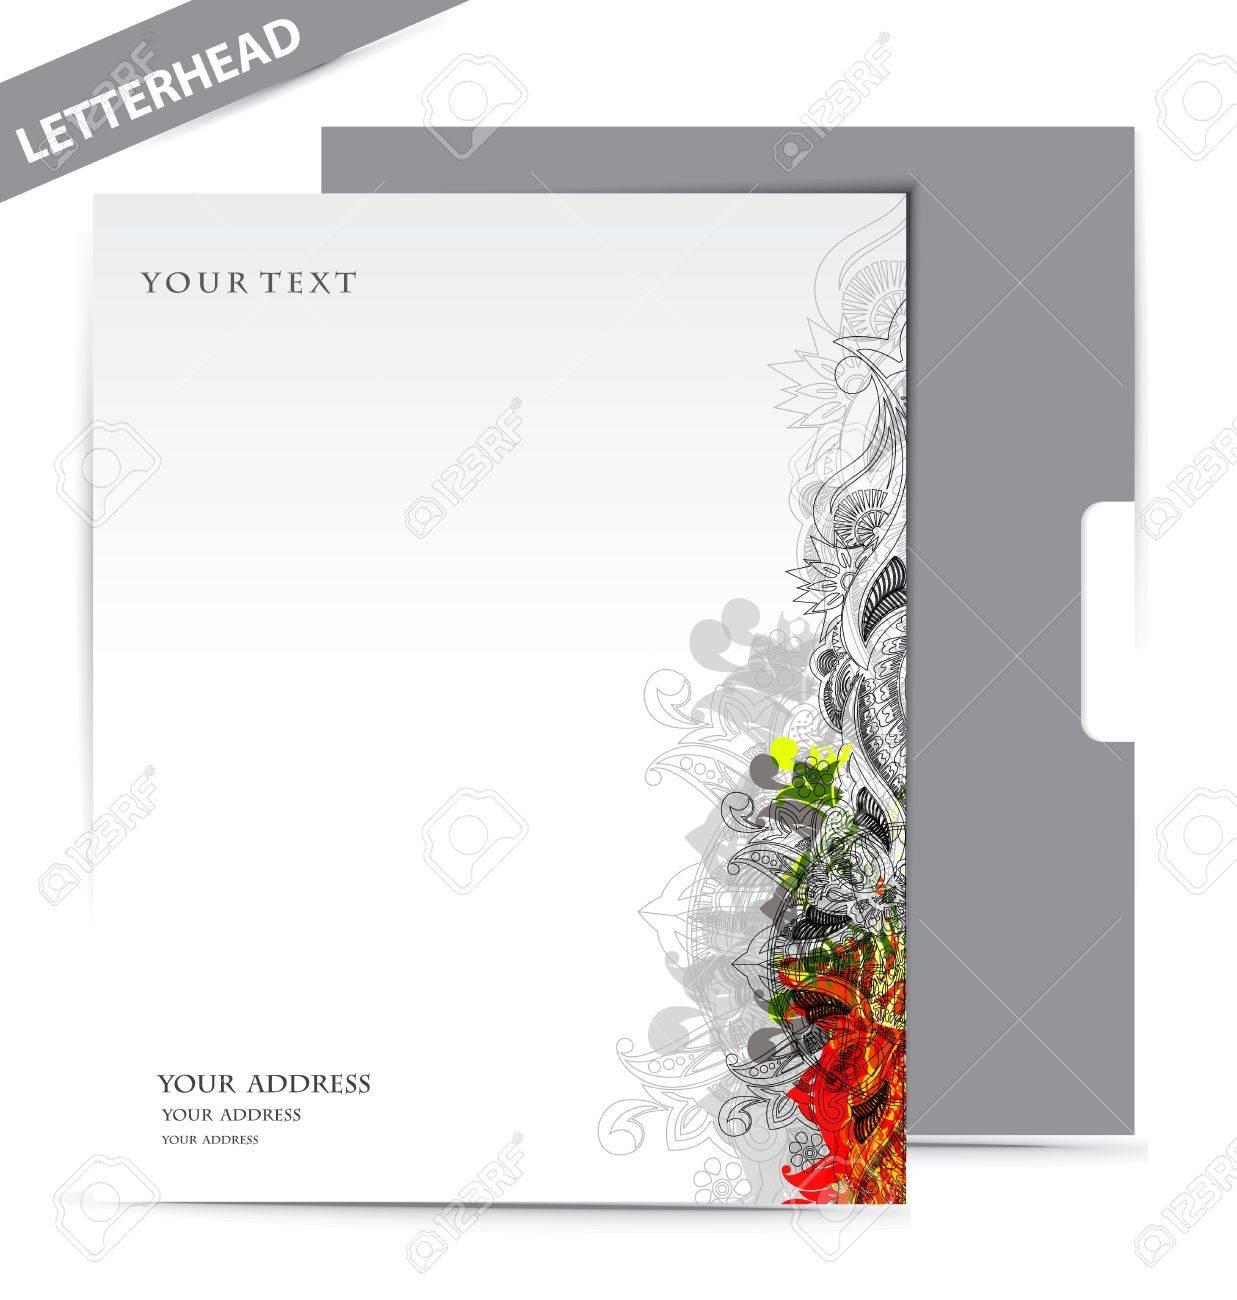 Paper envelope isolated on white background, vector illustration. Stock Vector - 7153557